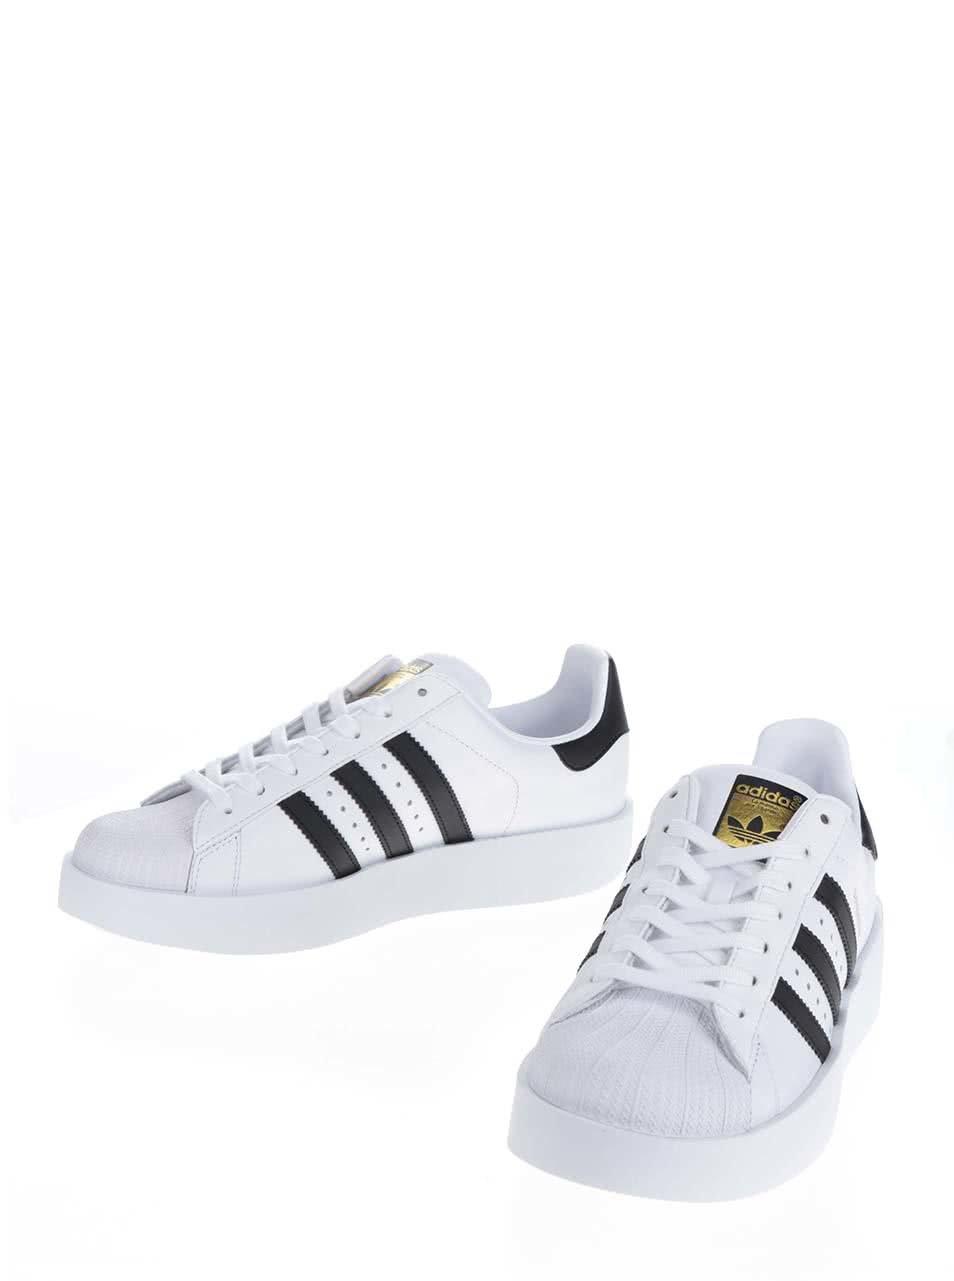 e38f098272b2 Biele dámske kožené tenisky na platforme adidas Originals Superstar ...